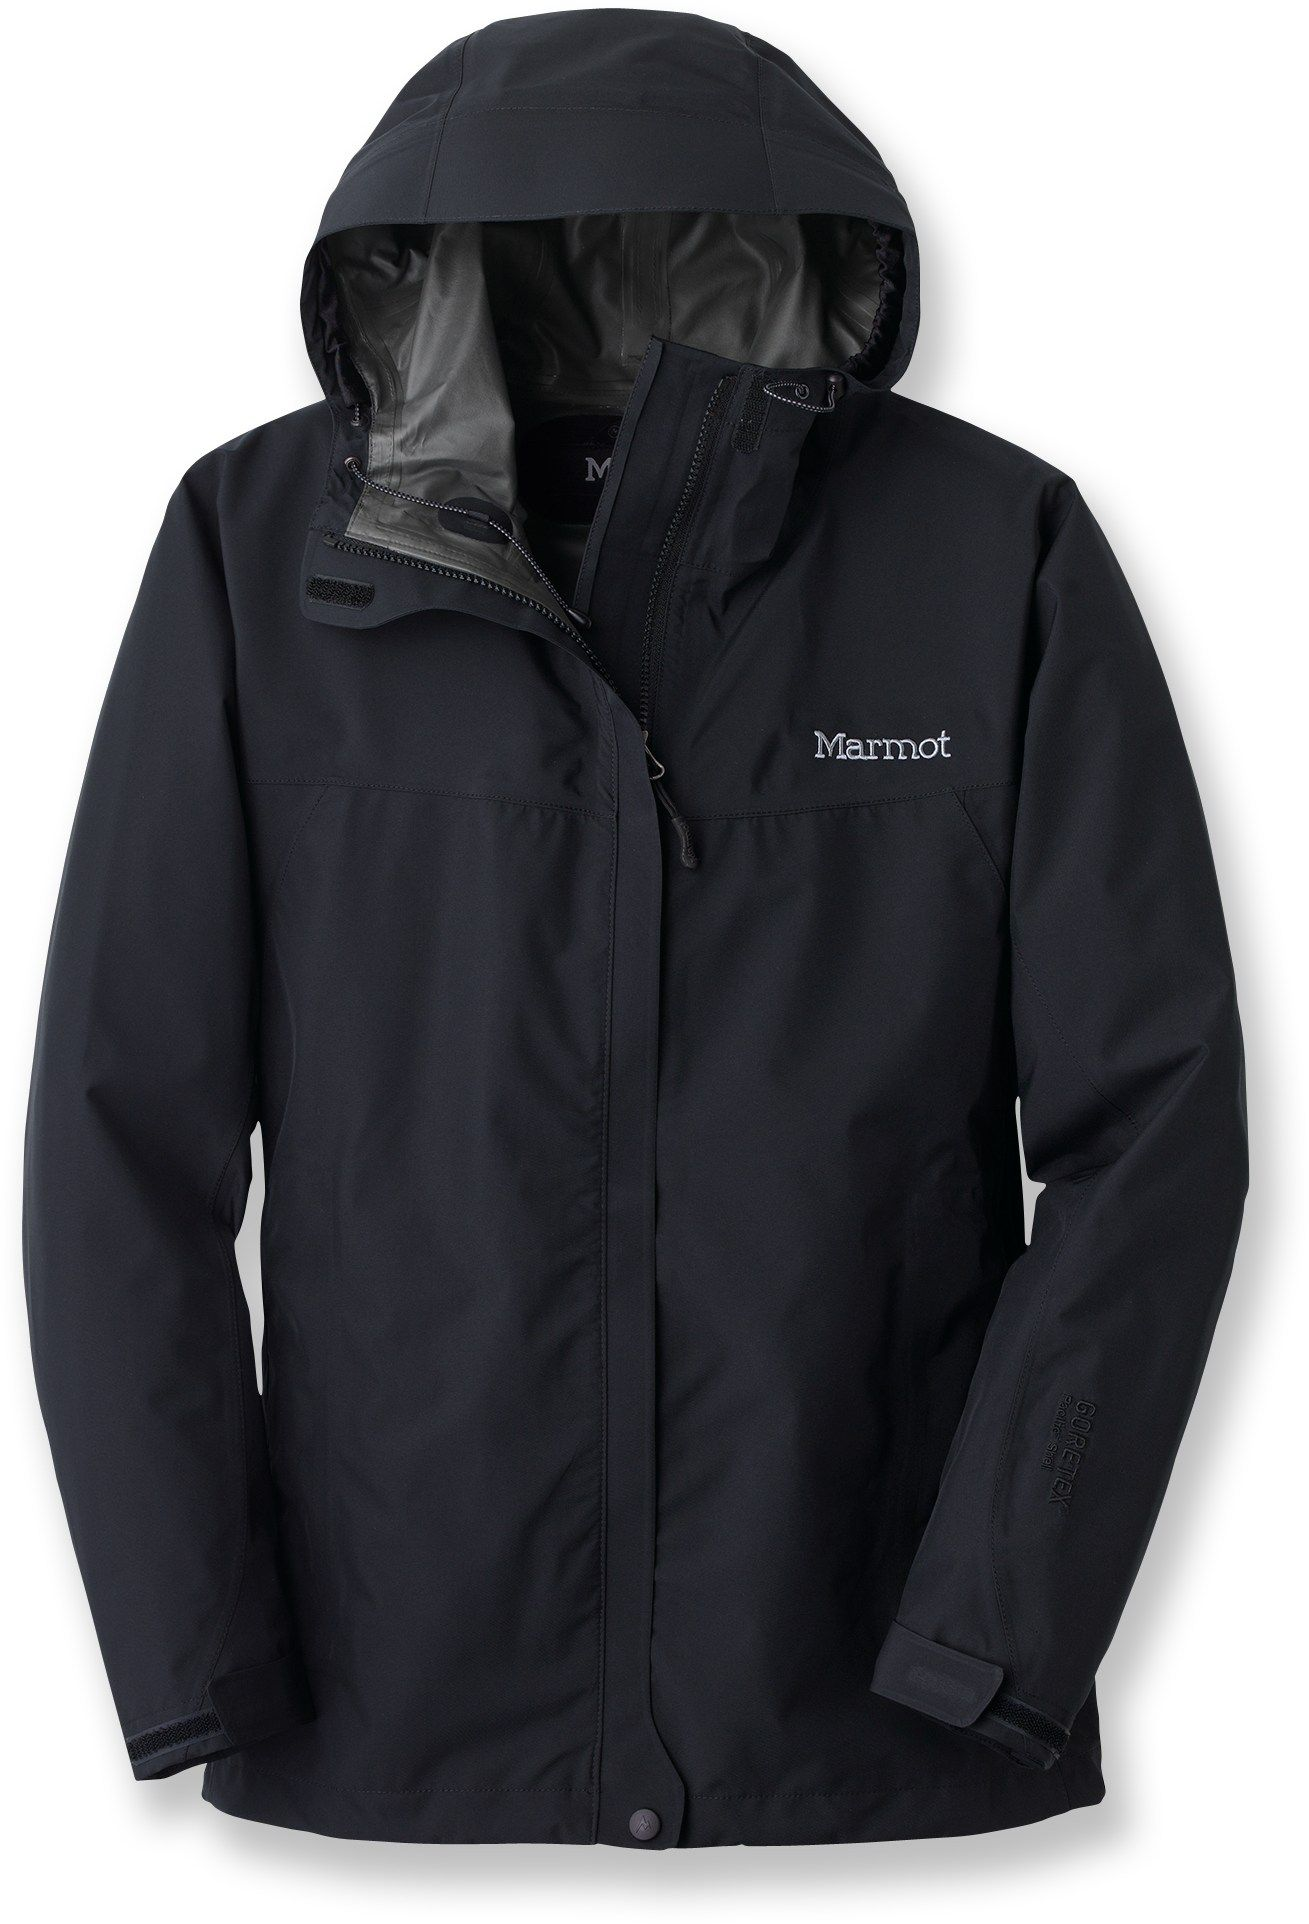 Marmot Women's Minimalist Rain Jacket Deep Plum XL | Marmot ...